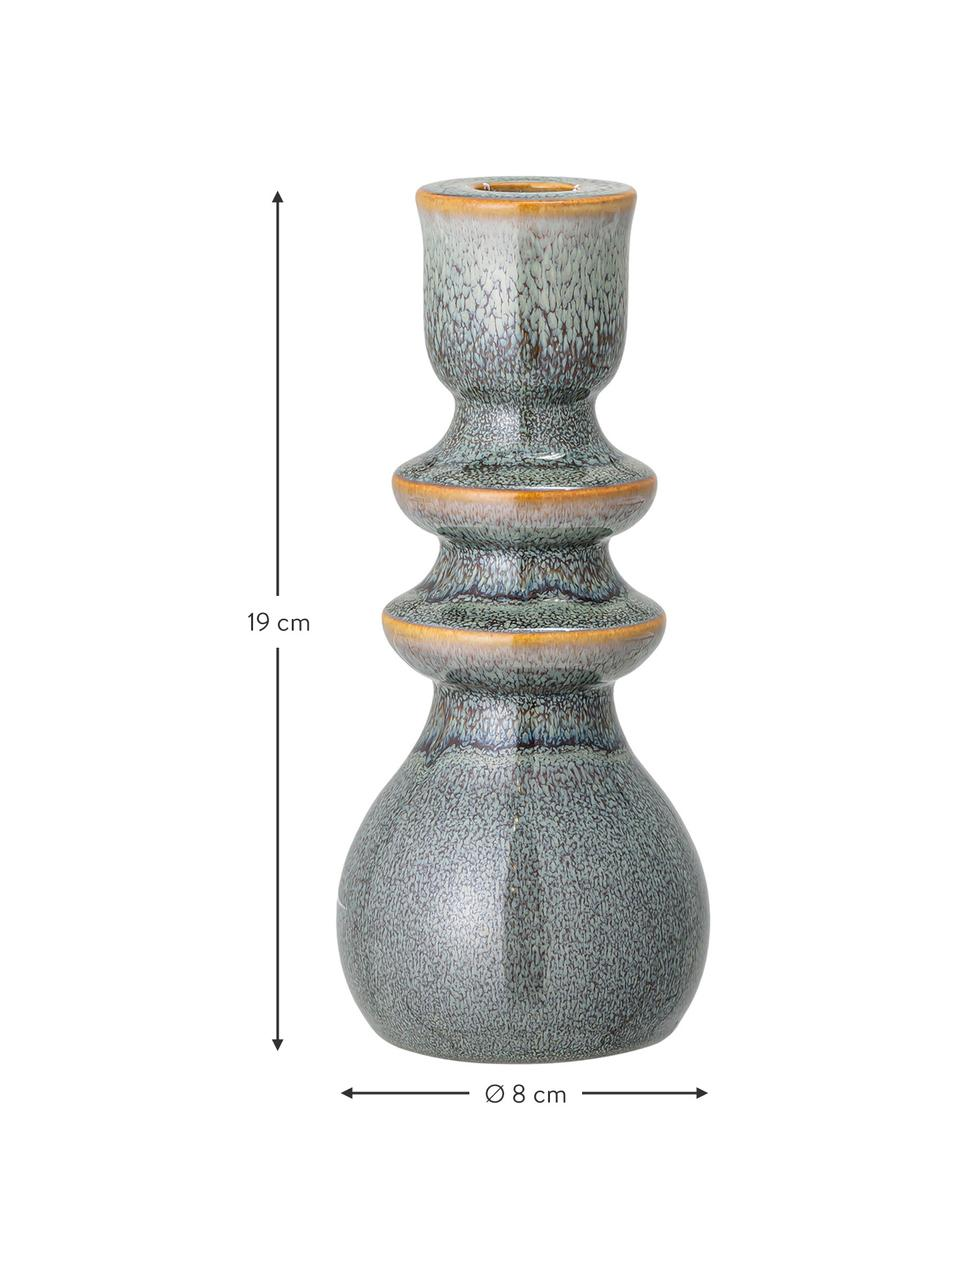 Handgemaakte kandelaar Kit, Keramiek, Groen, bruin, Ø 8 x H 19 cm